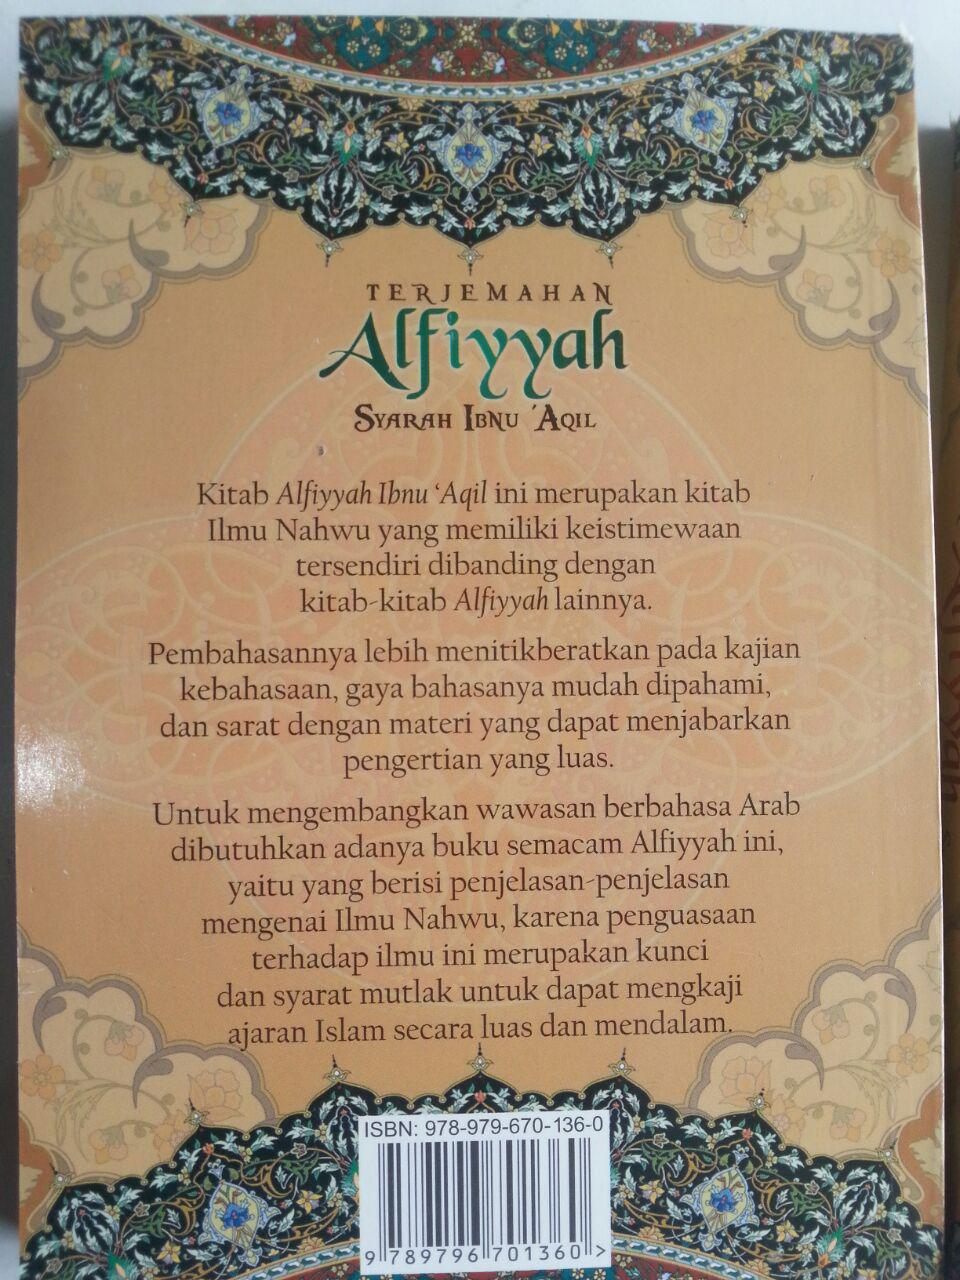 Buku Terjemahan Alfiyyah Syarah Ibnu Aqil Soft Cover Set 2 Jilid cover